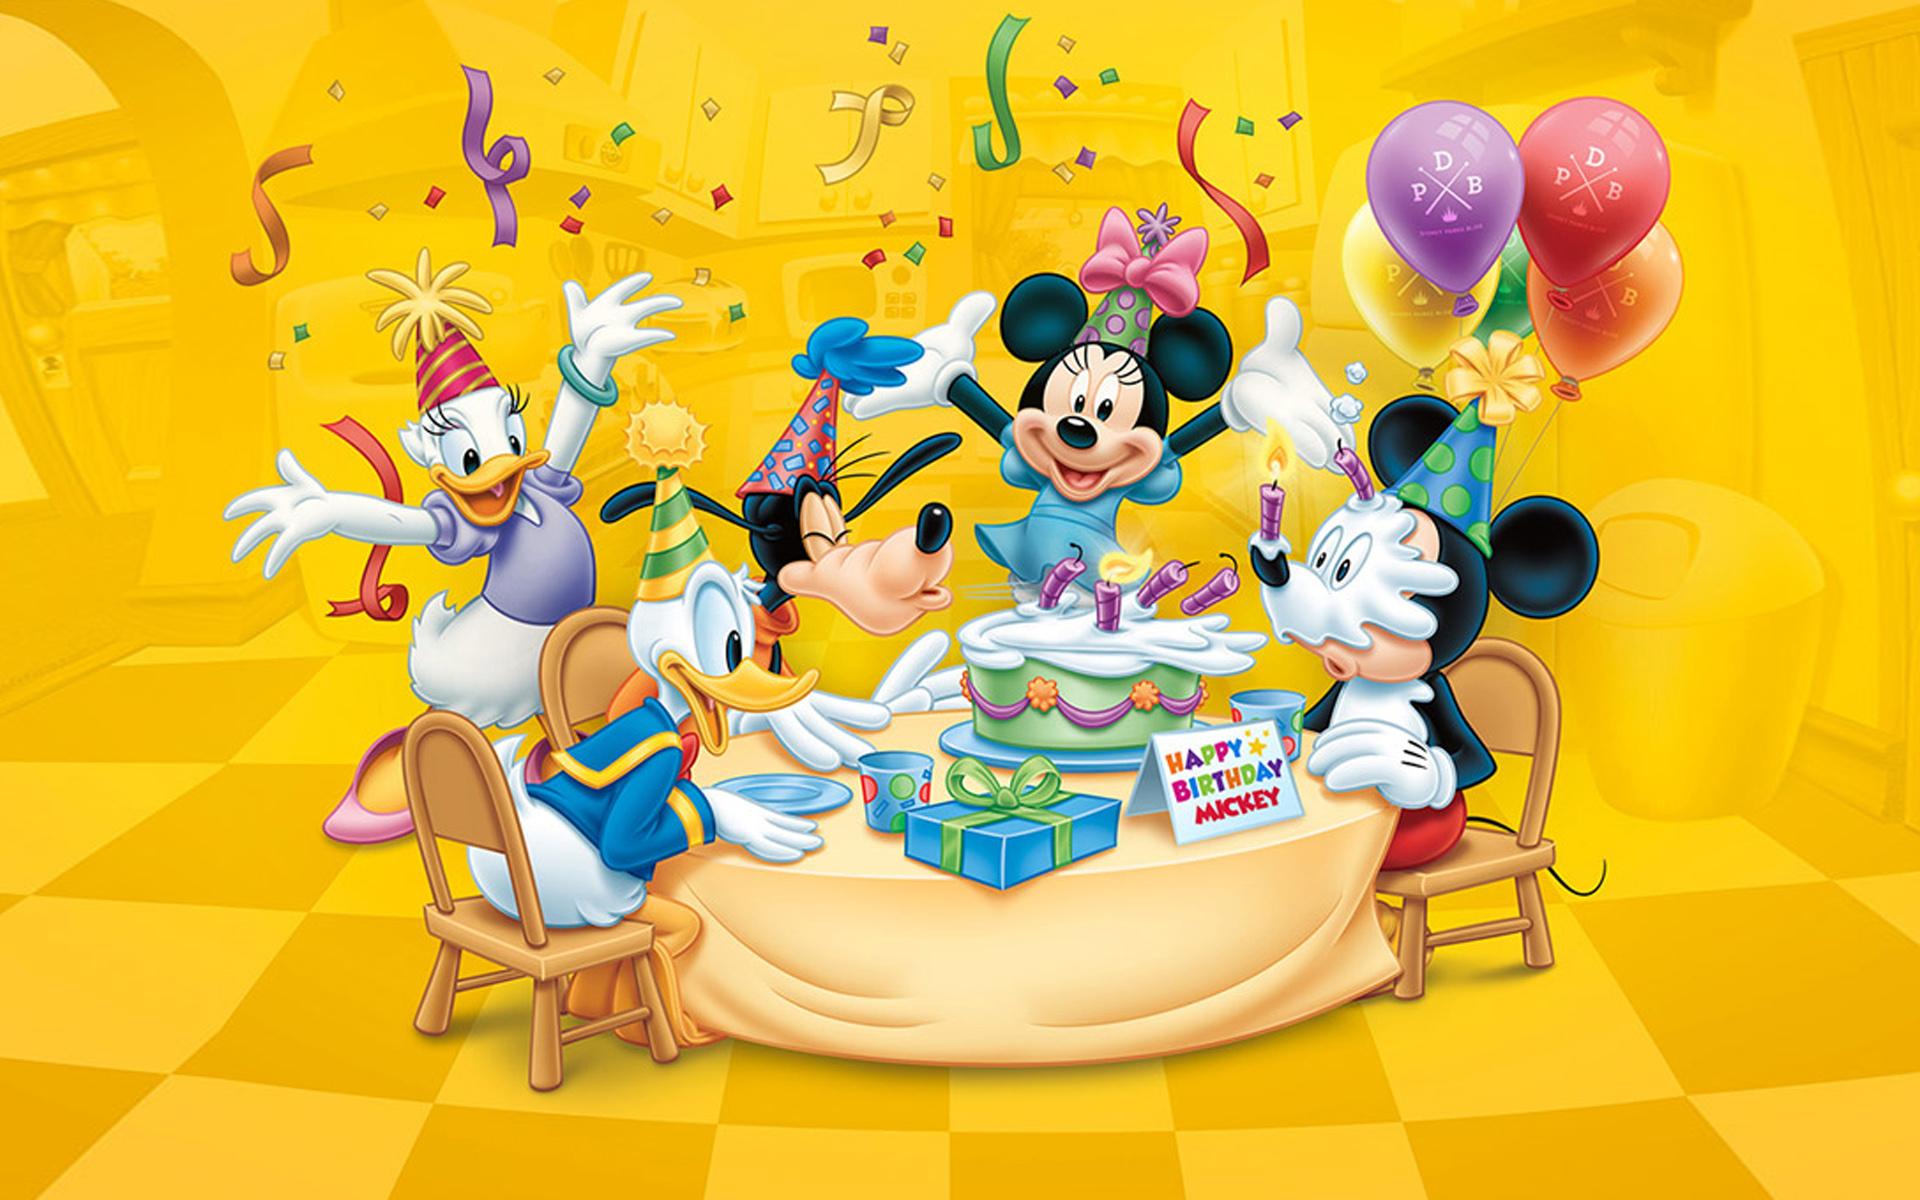 Wallpaper Hd Mickey Mouse Happy Birthday Mickey Celebration Birthday Cake Balloon